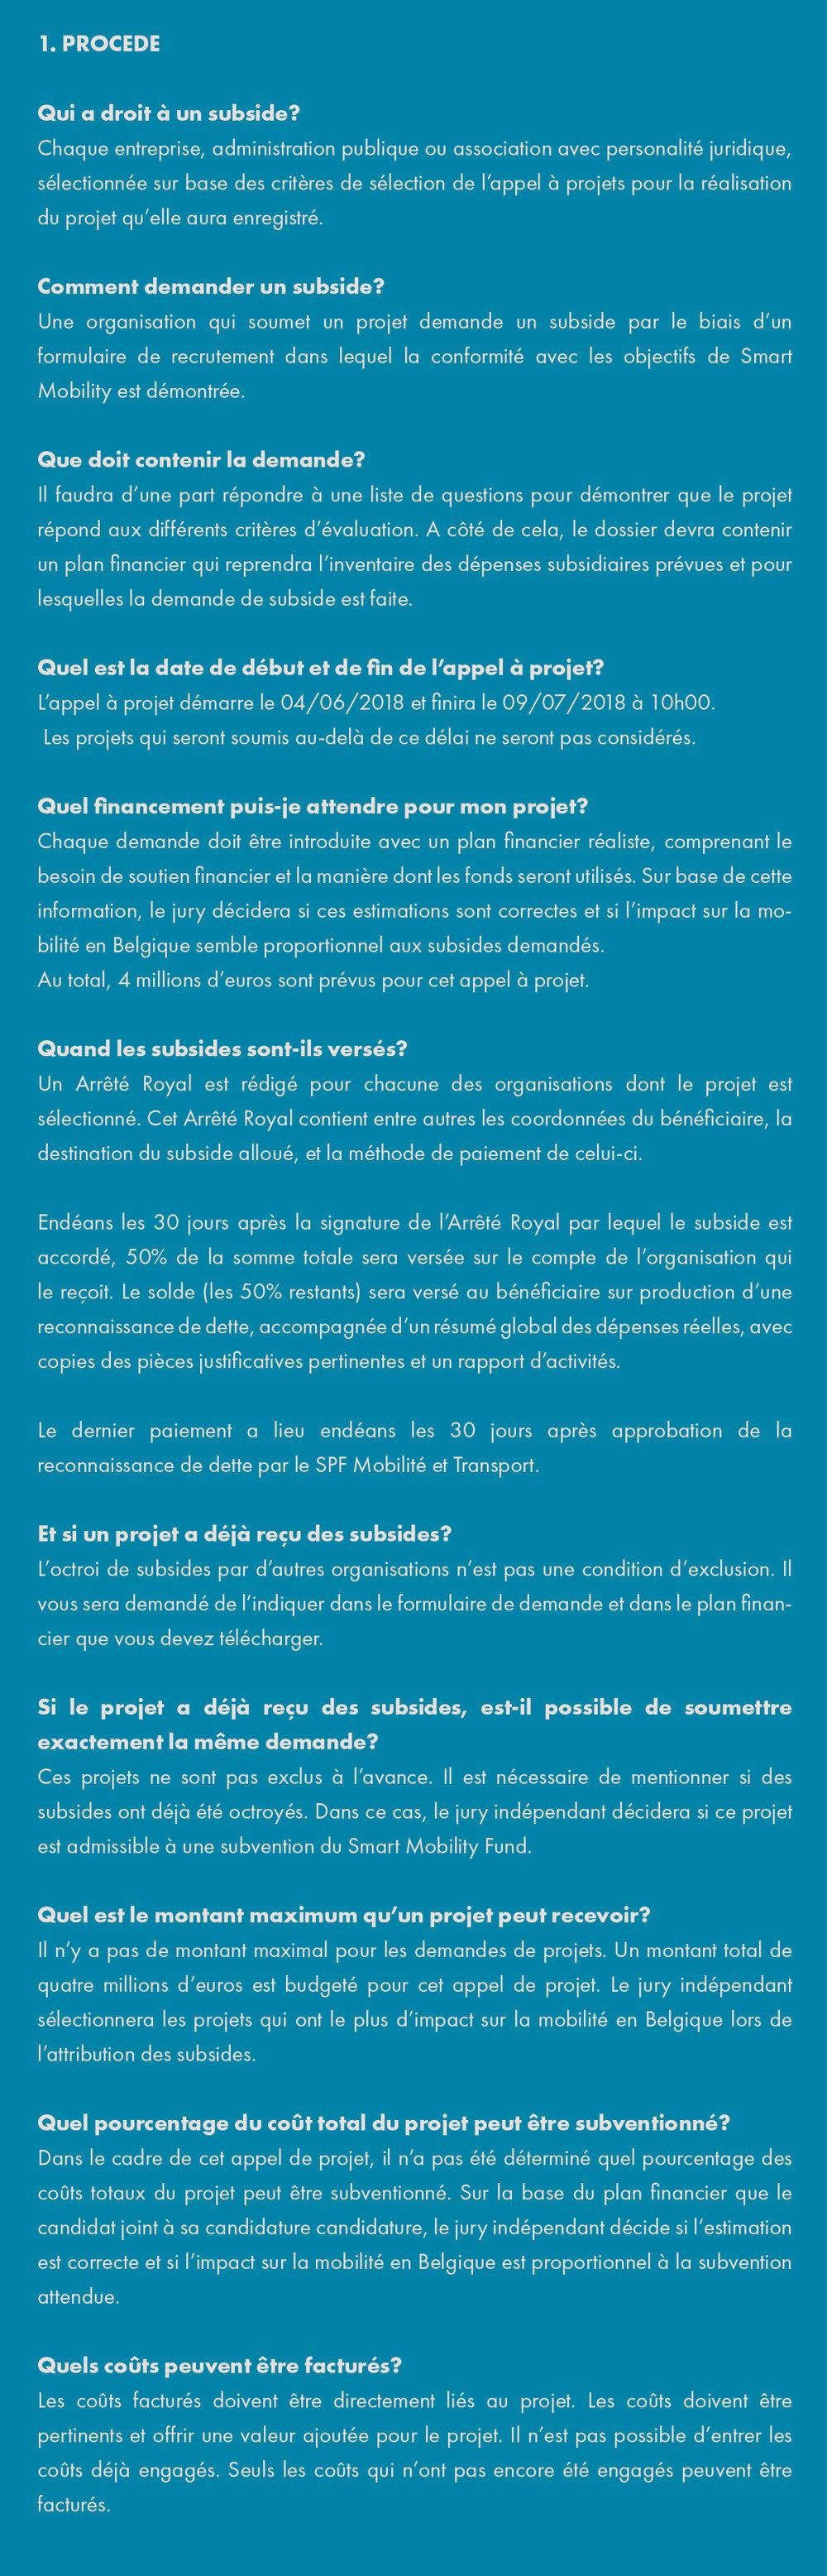 DELOITTE-SMB-TXT-PROCESBLOK1-FR.jpg